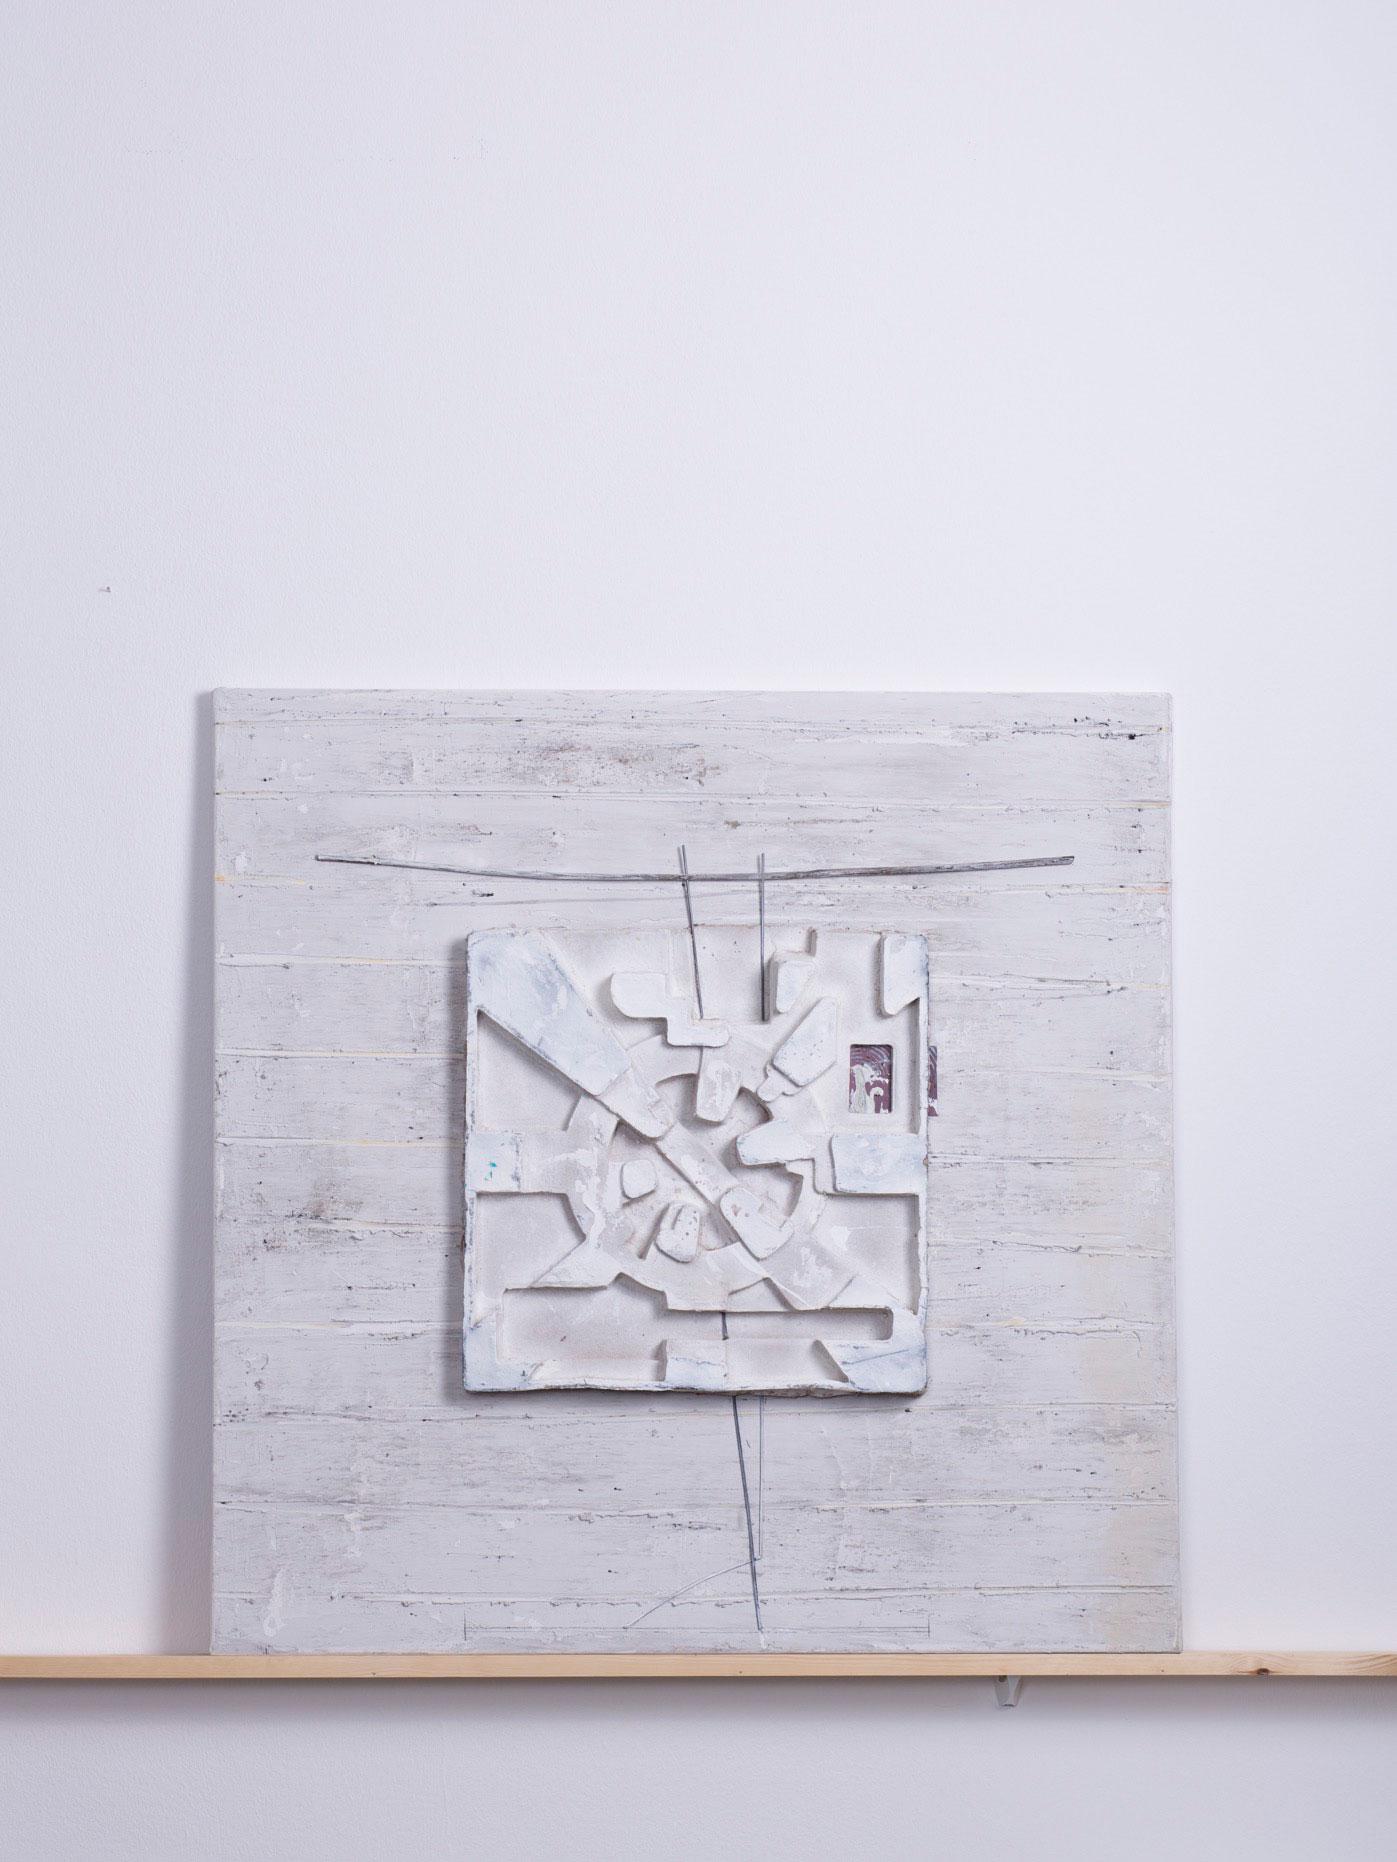 Turborum, 2012 - 90x90 cm, <br>Acryl, Spachtel und Karton auf Leinwand